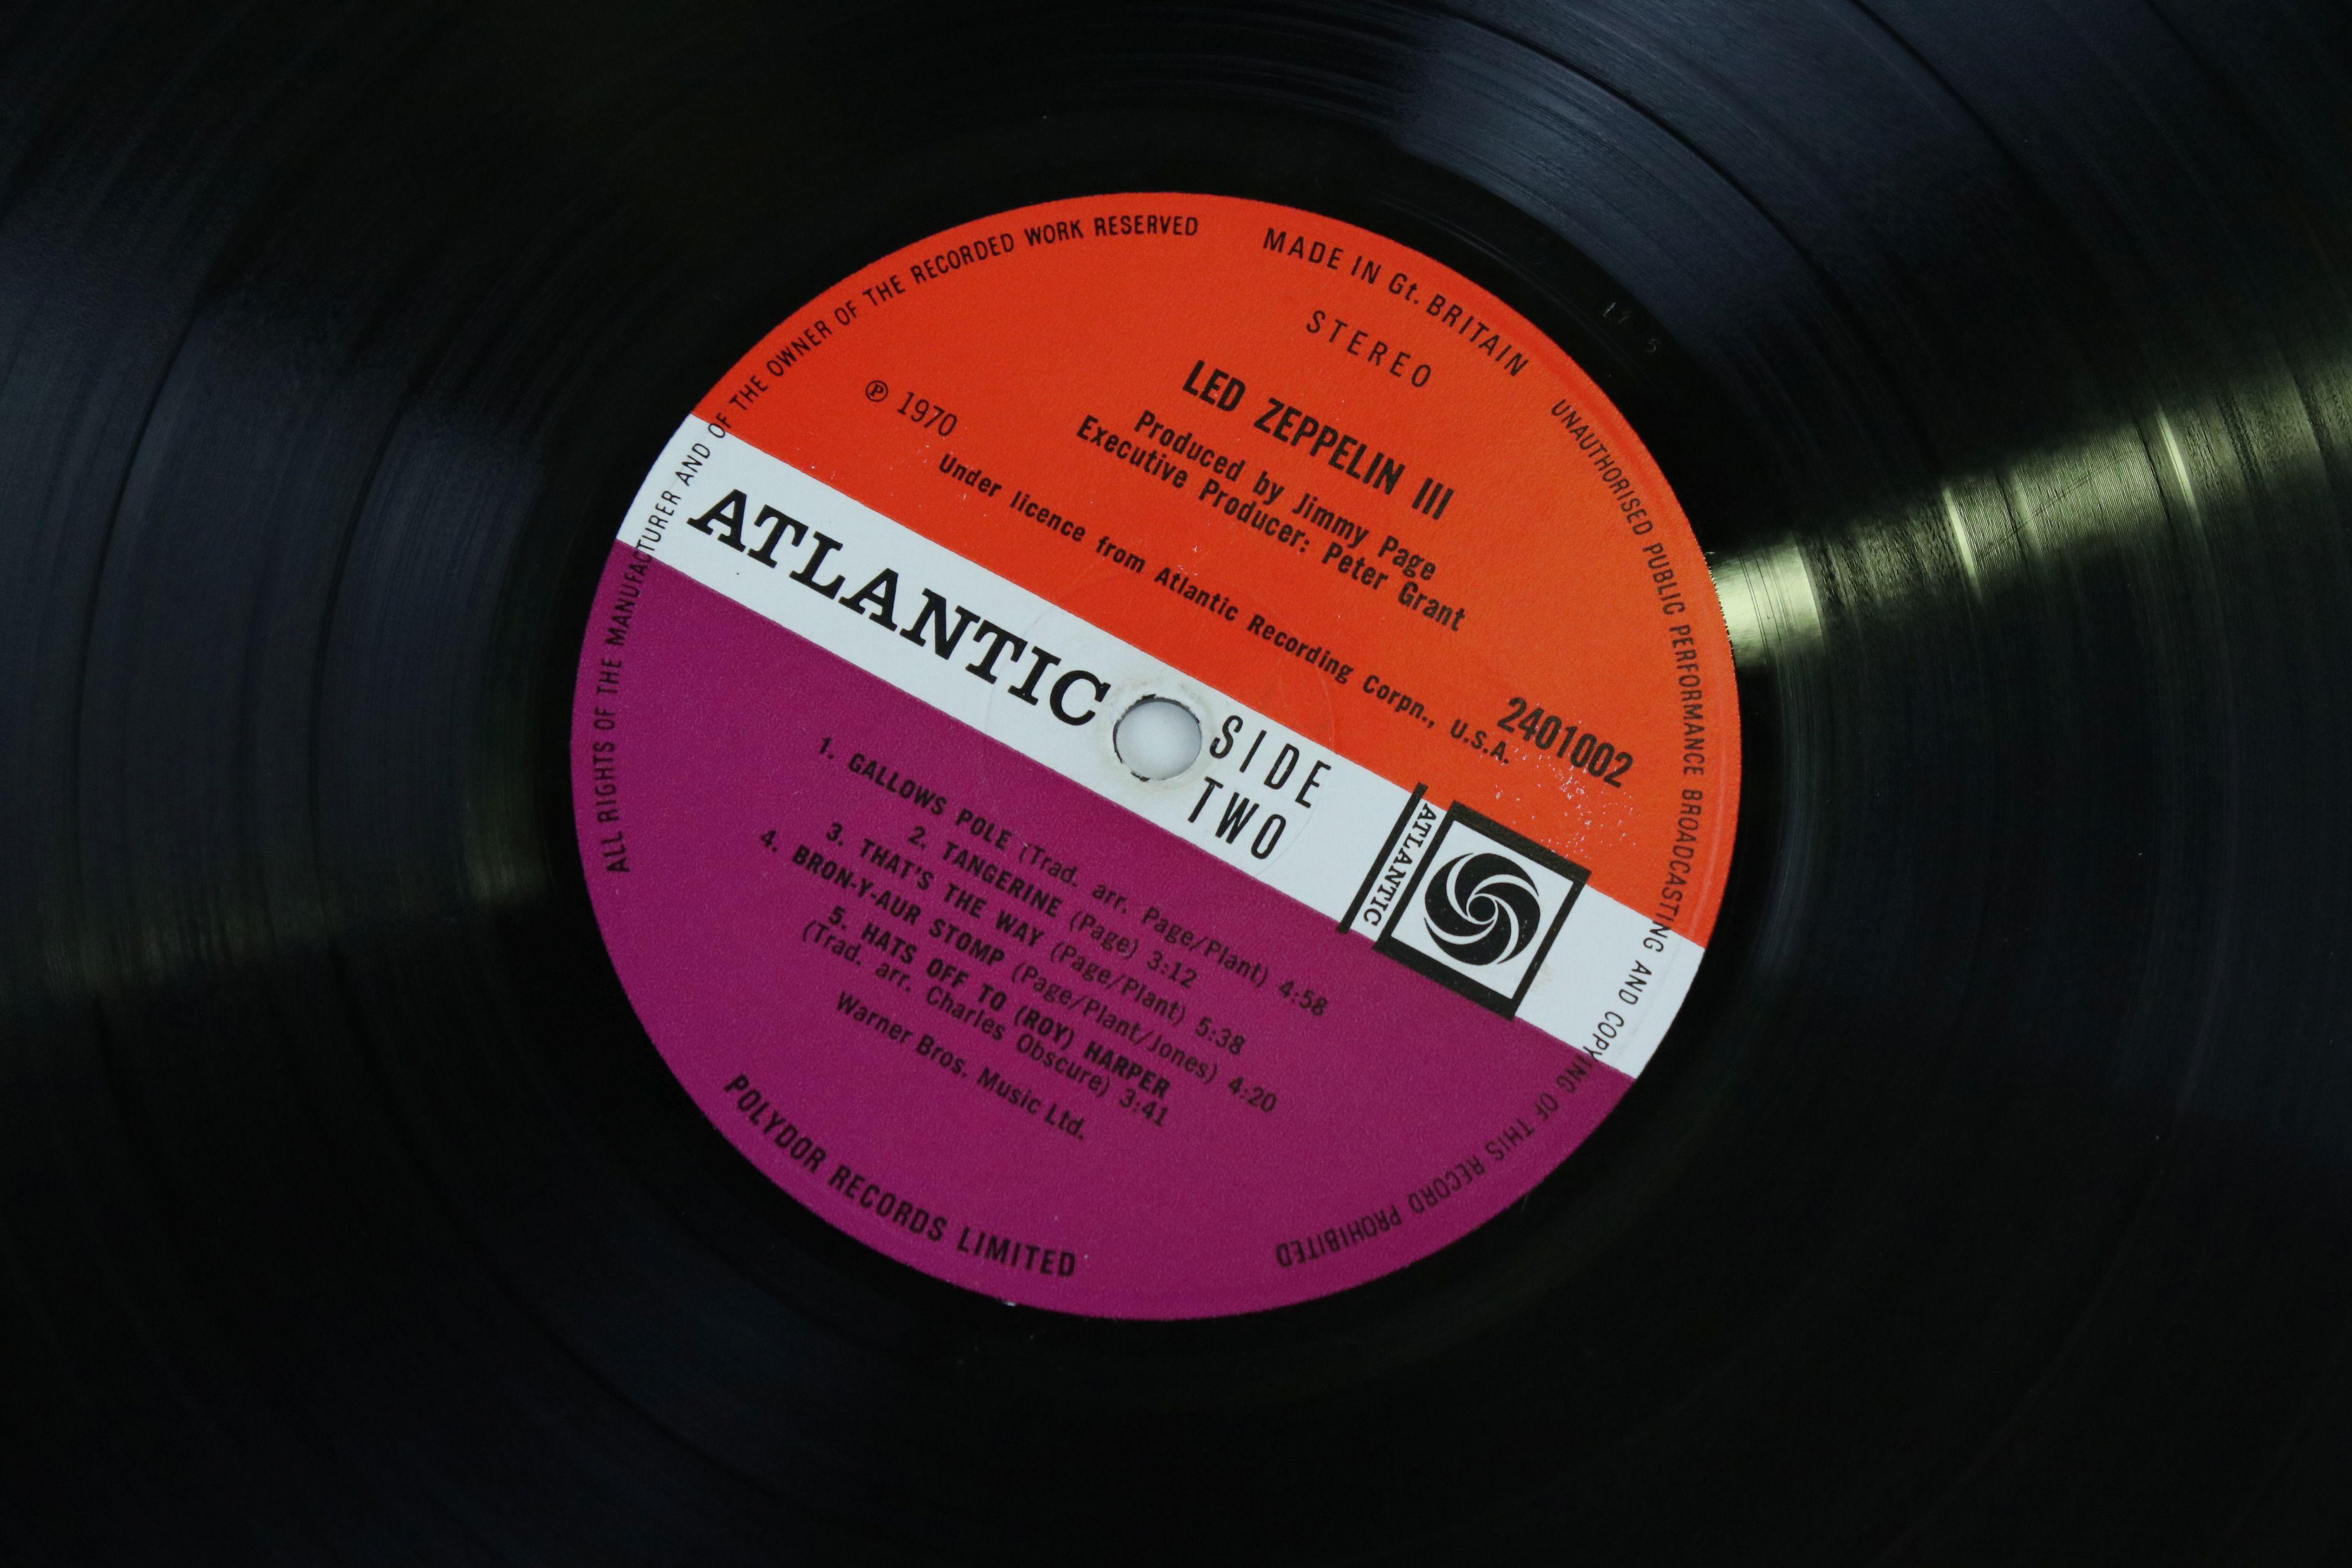 Vinyl - Led Zeppelin III LP on Atlantic Deluxe 2401002 red/maroon label, 1st pressing, sleeve vg - Image 4 of 7